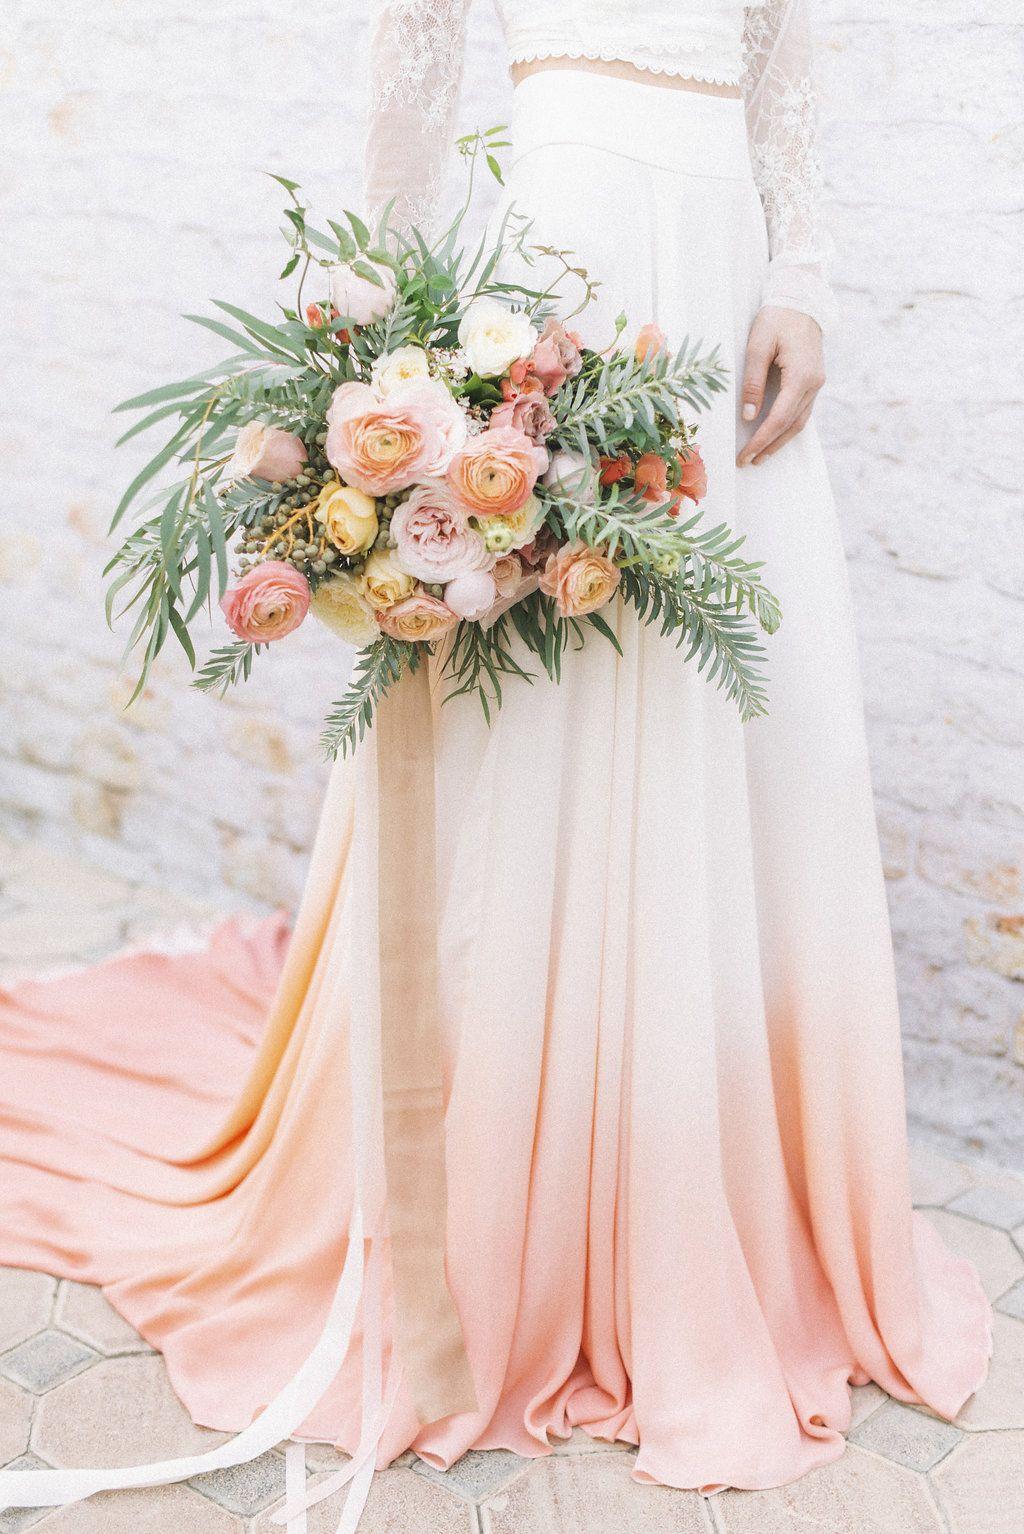 House Of Moirai Dip Dye Skirt And Lace Top Bride Bohemian